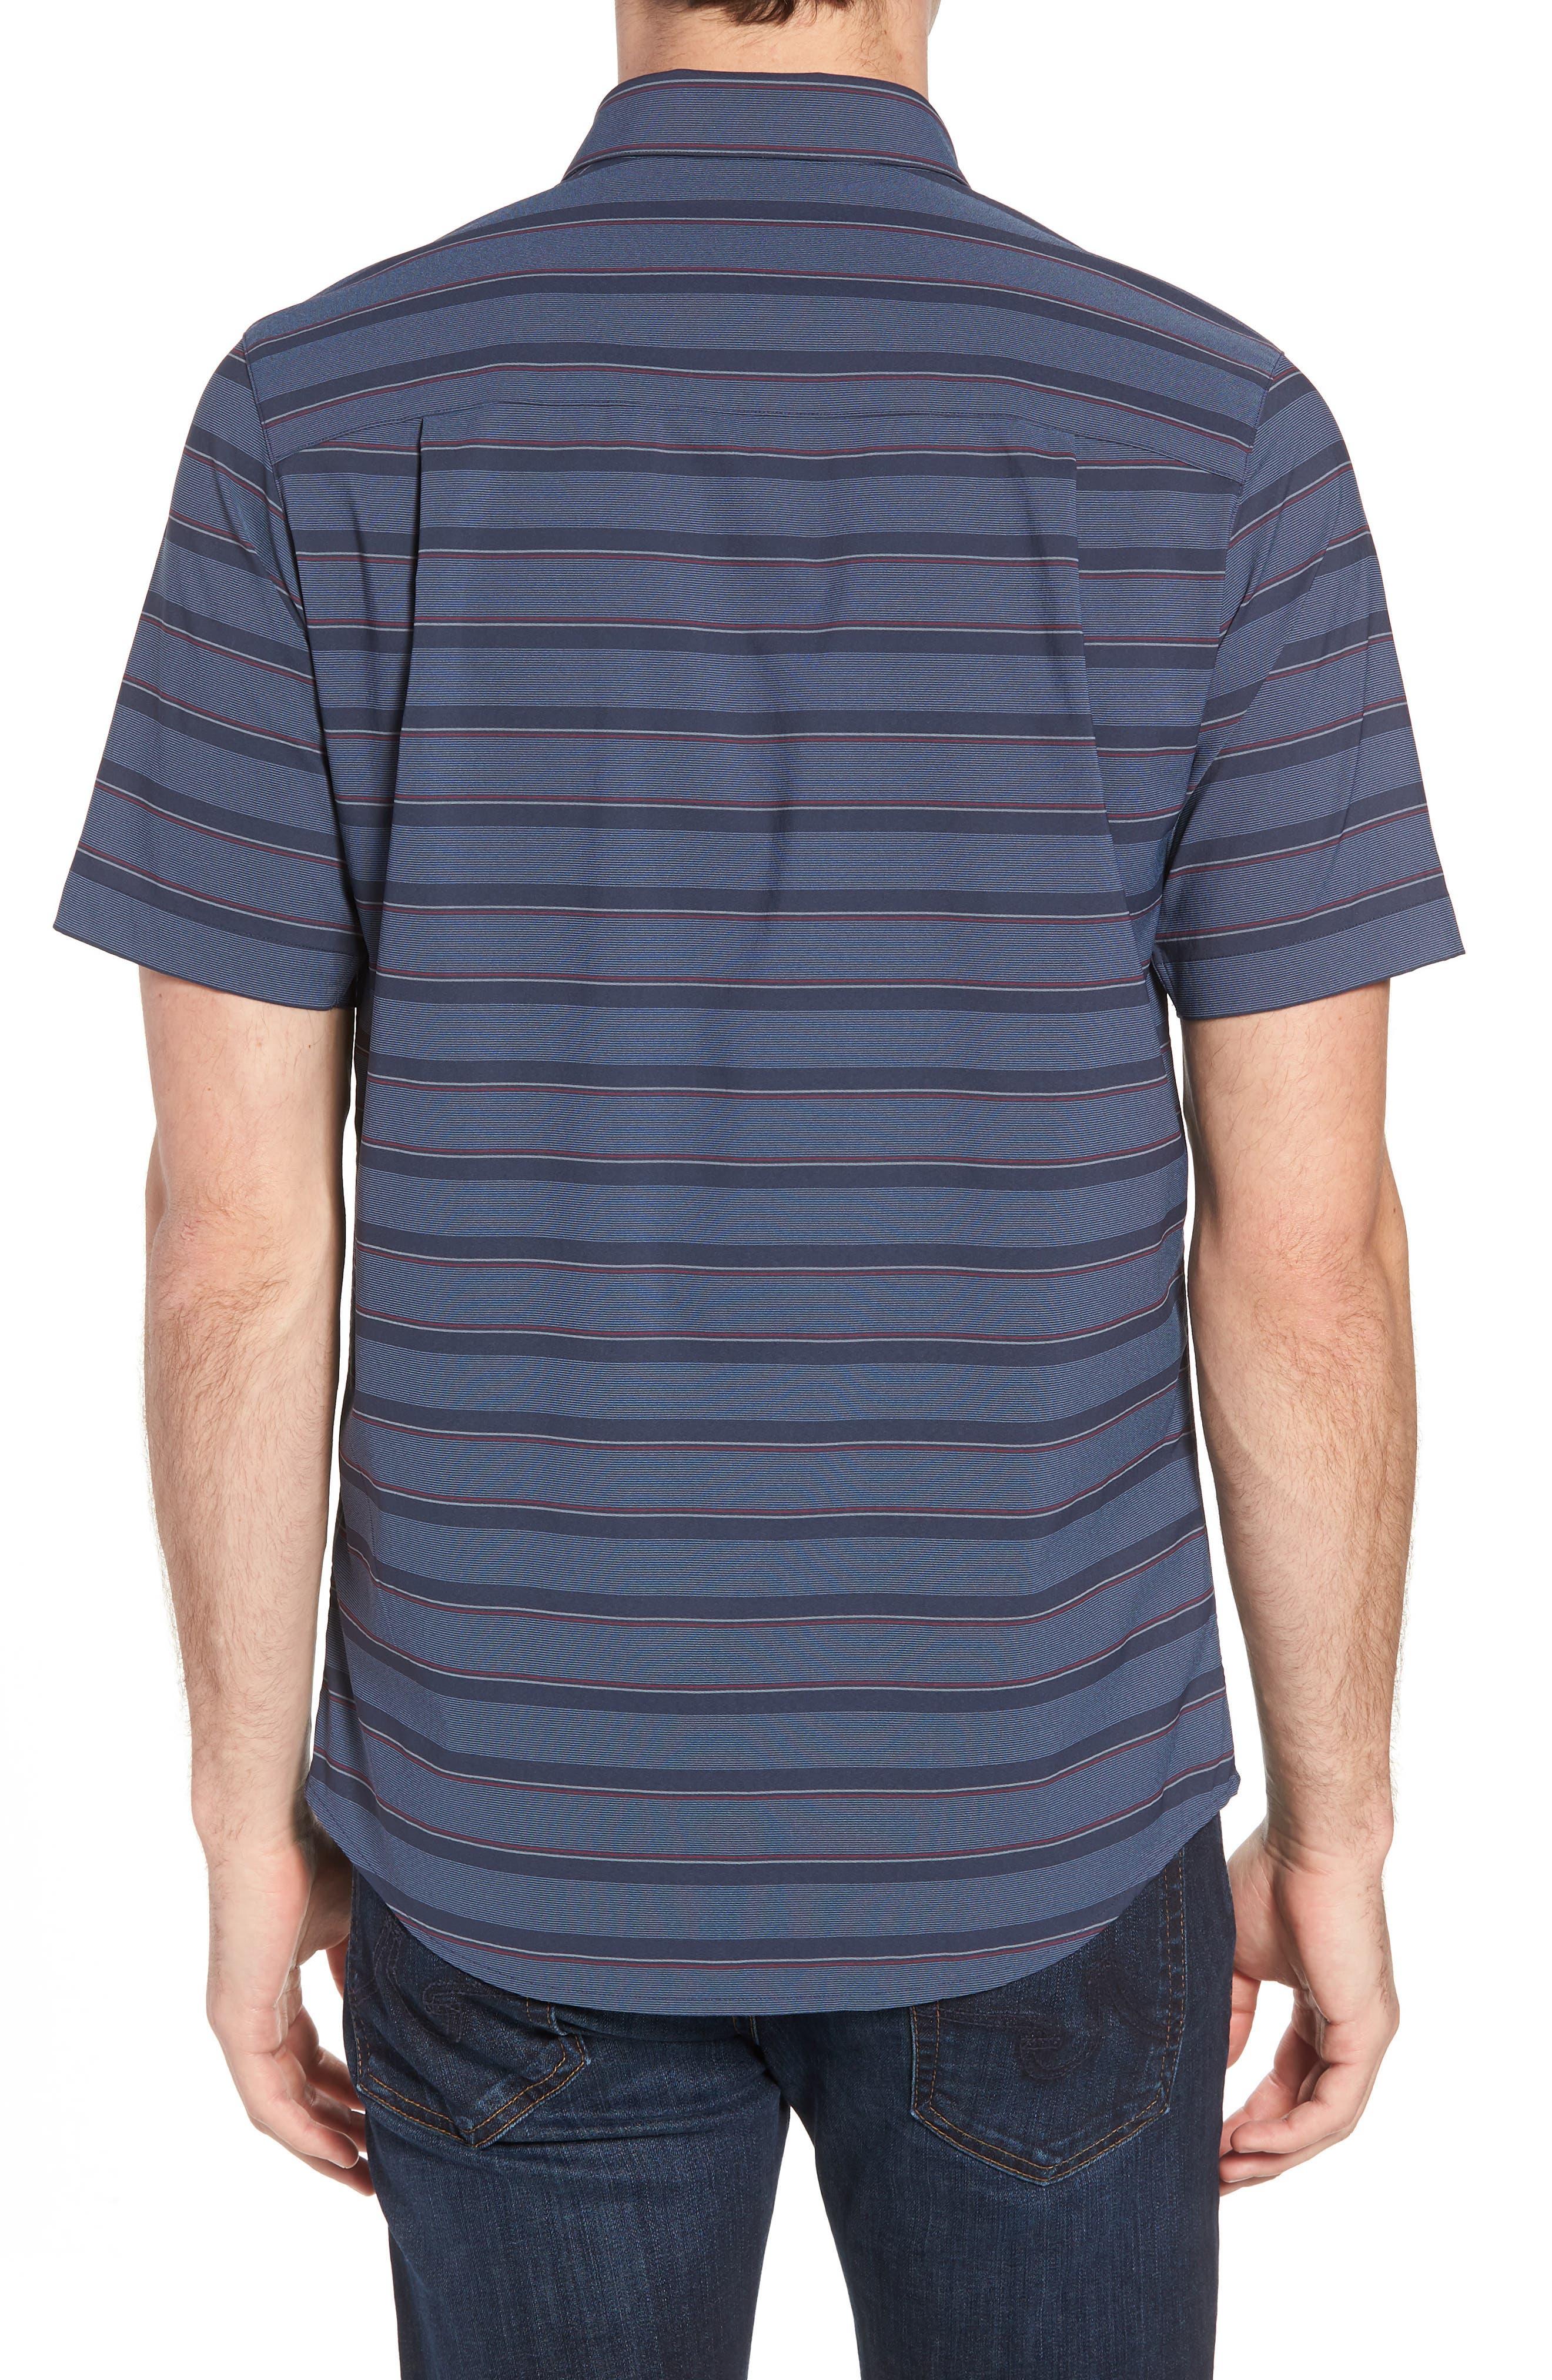 Quiver Regular Fit Sport Shirt,                             Alternate thumbnail 2, color,                             400